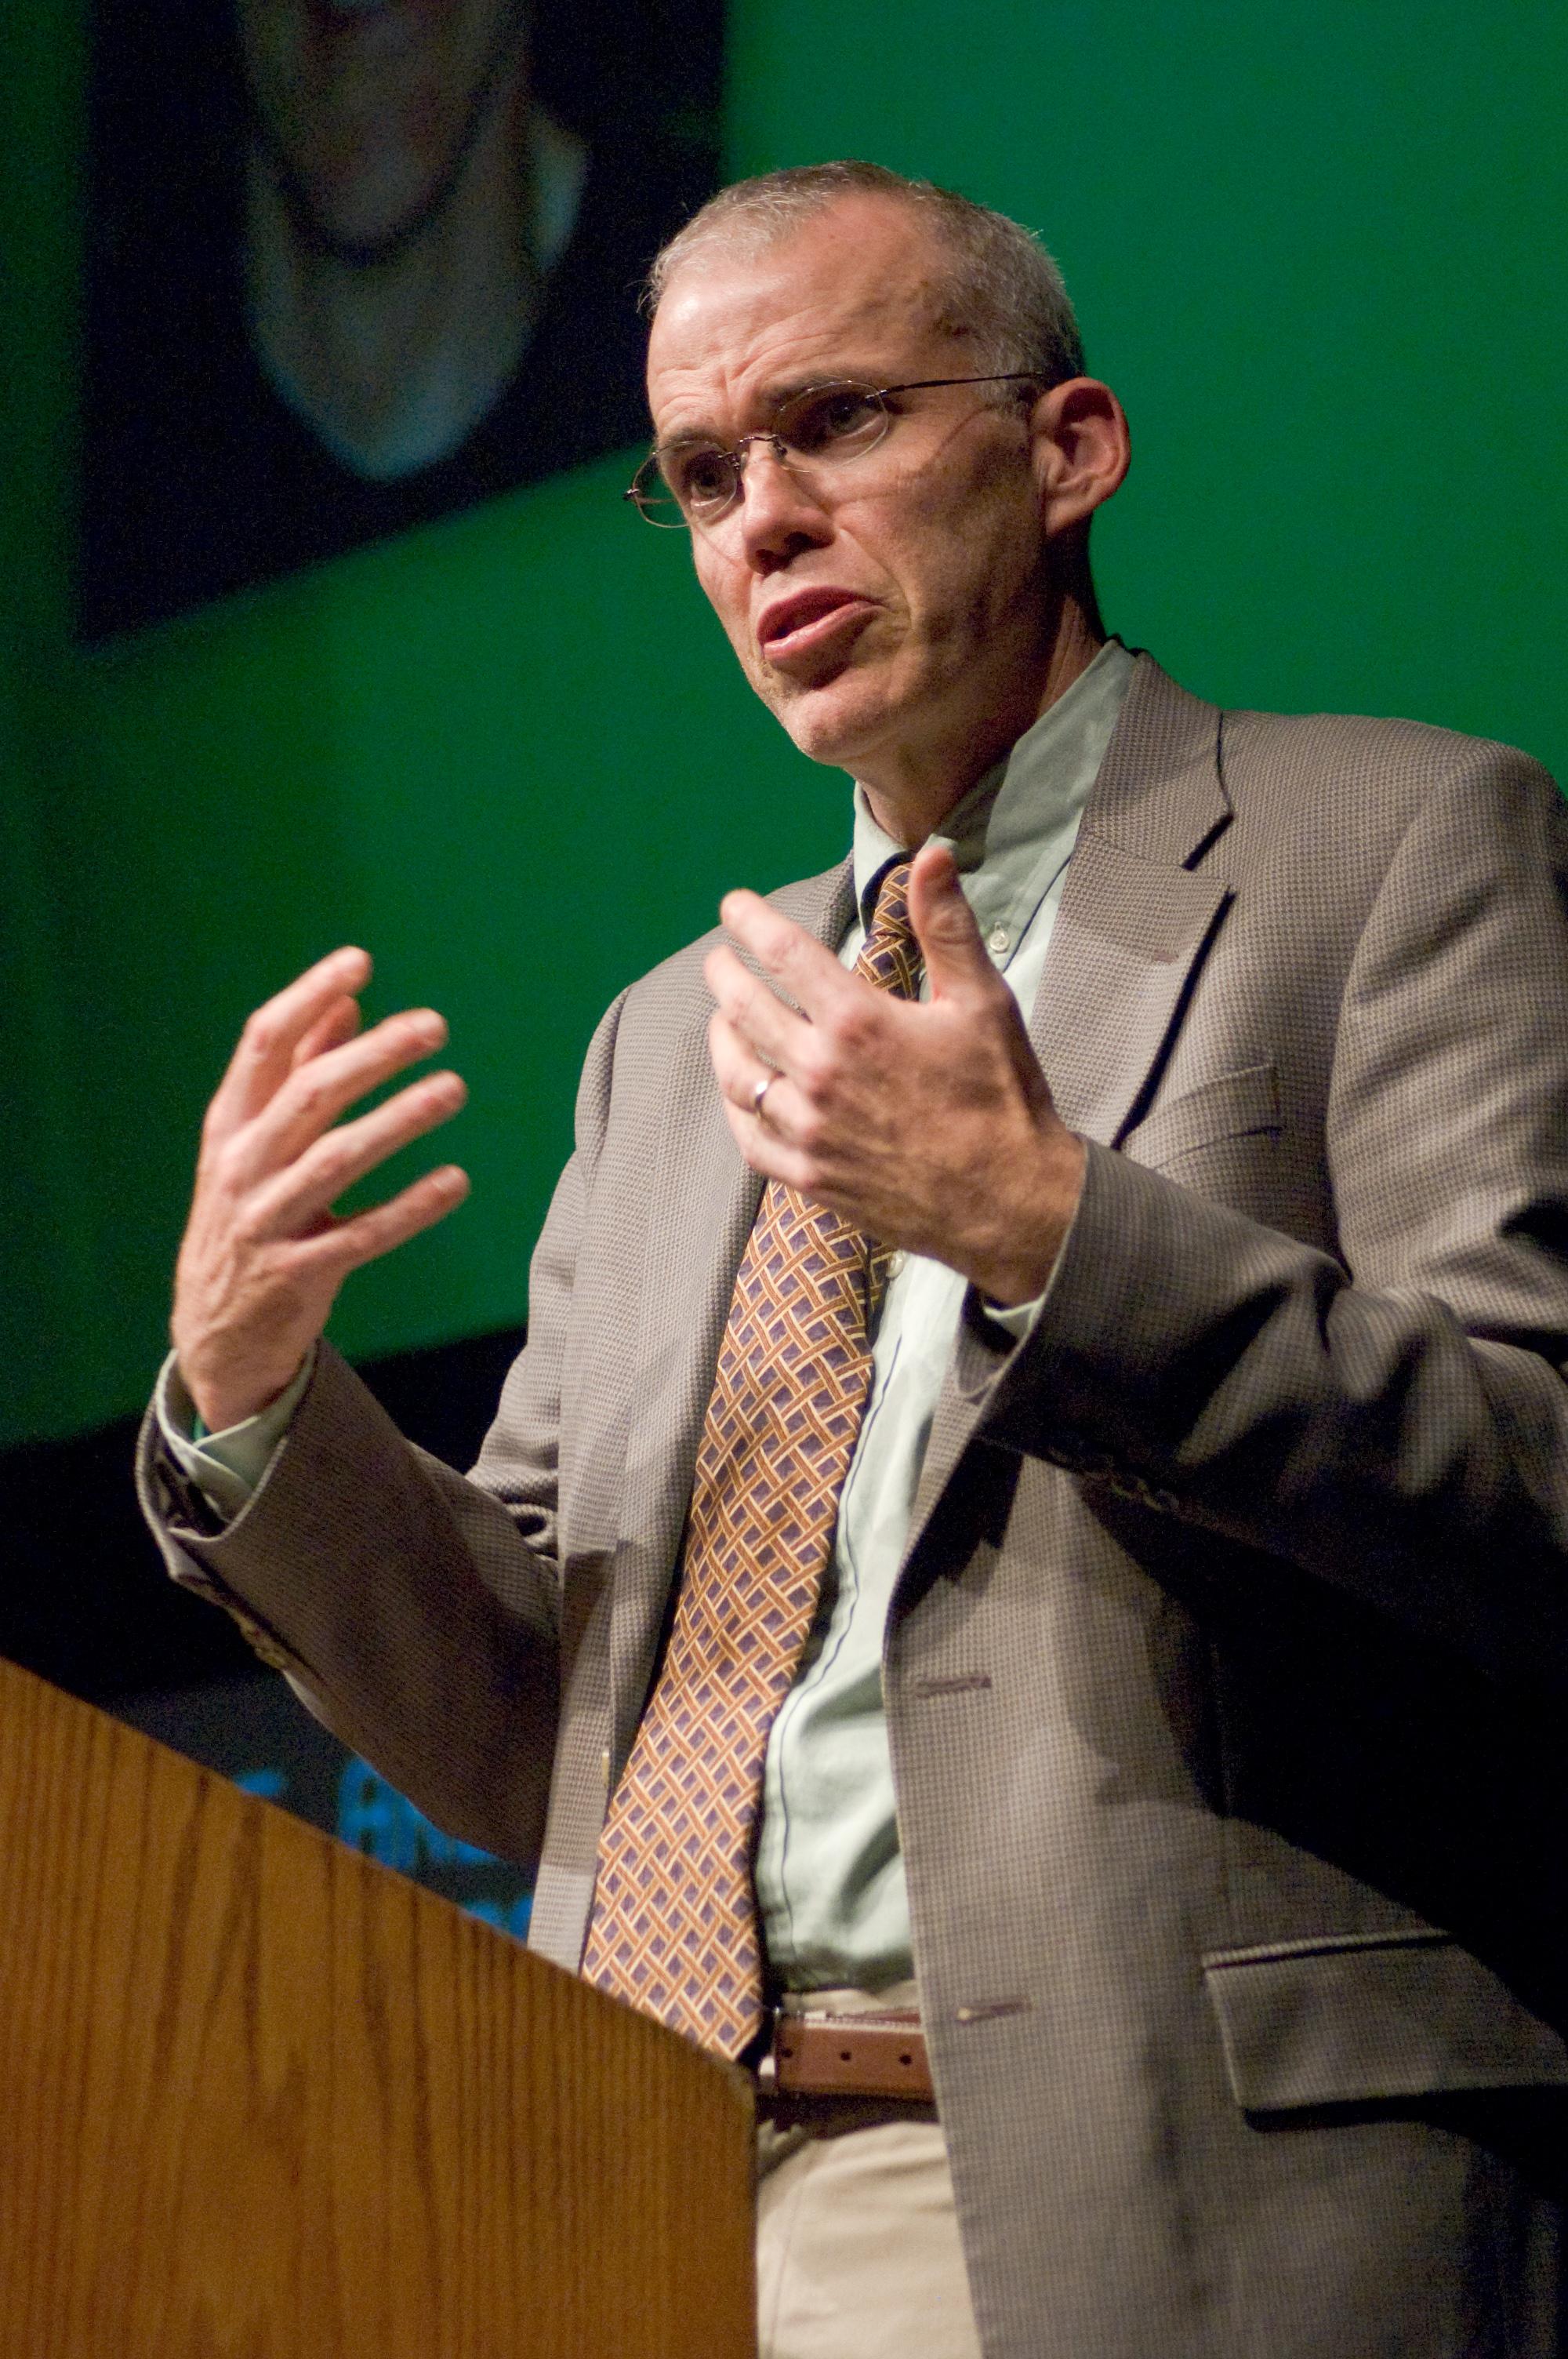 Bill McKibben speaking at [[Rochester Institute of Technology]], November 6, 2008